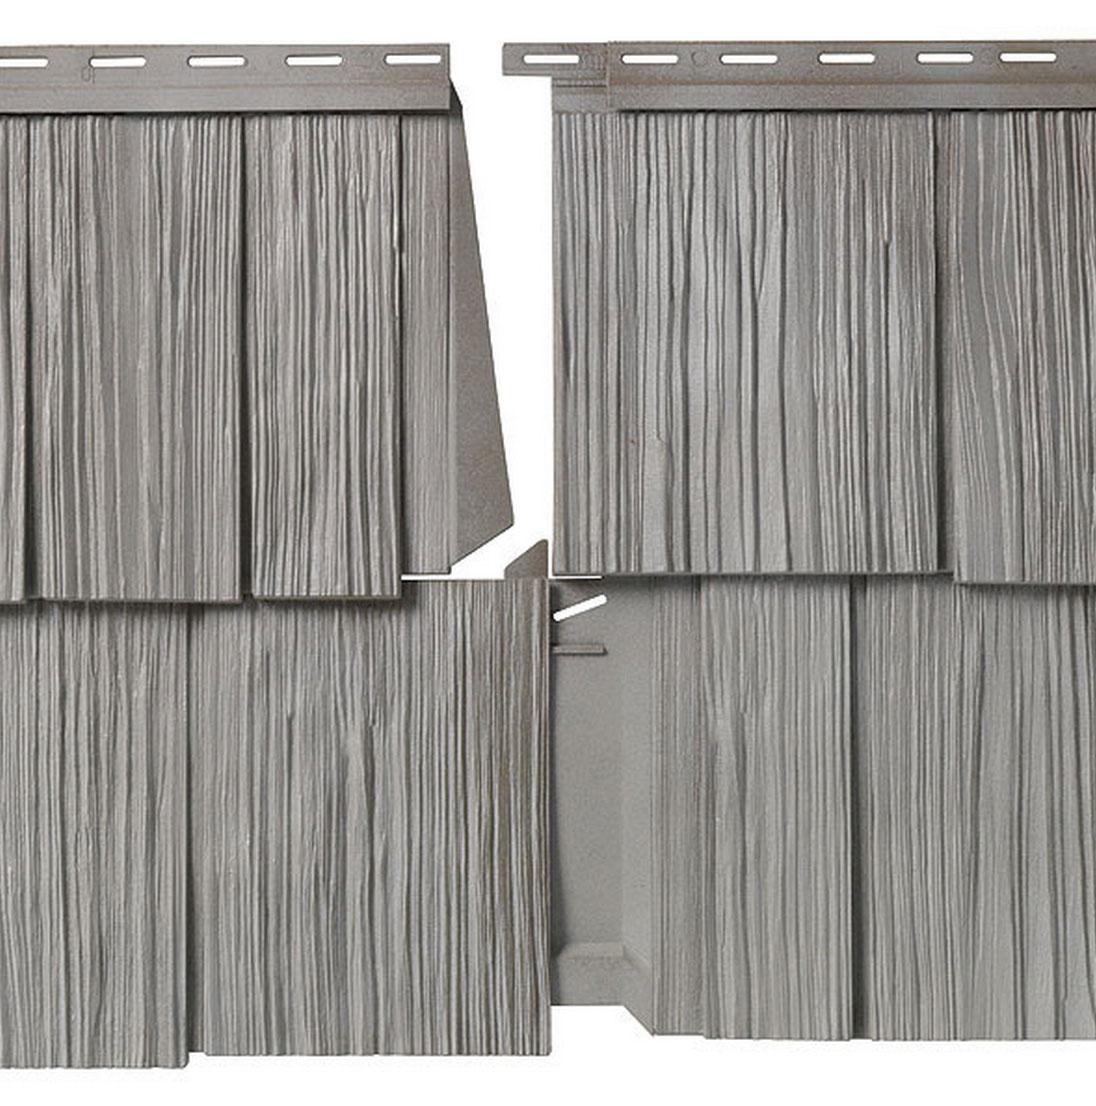 Mastic Vinyl or Polymer Lap Siding, Gray